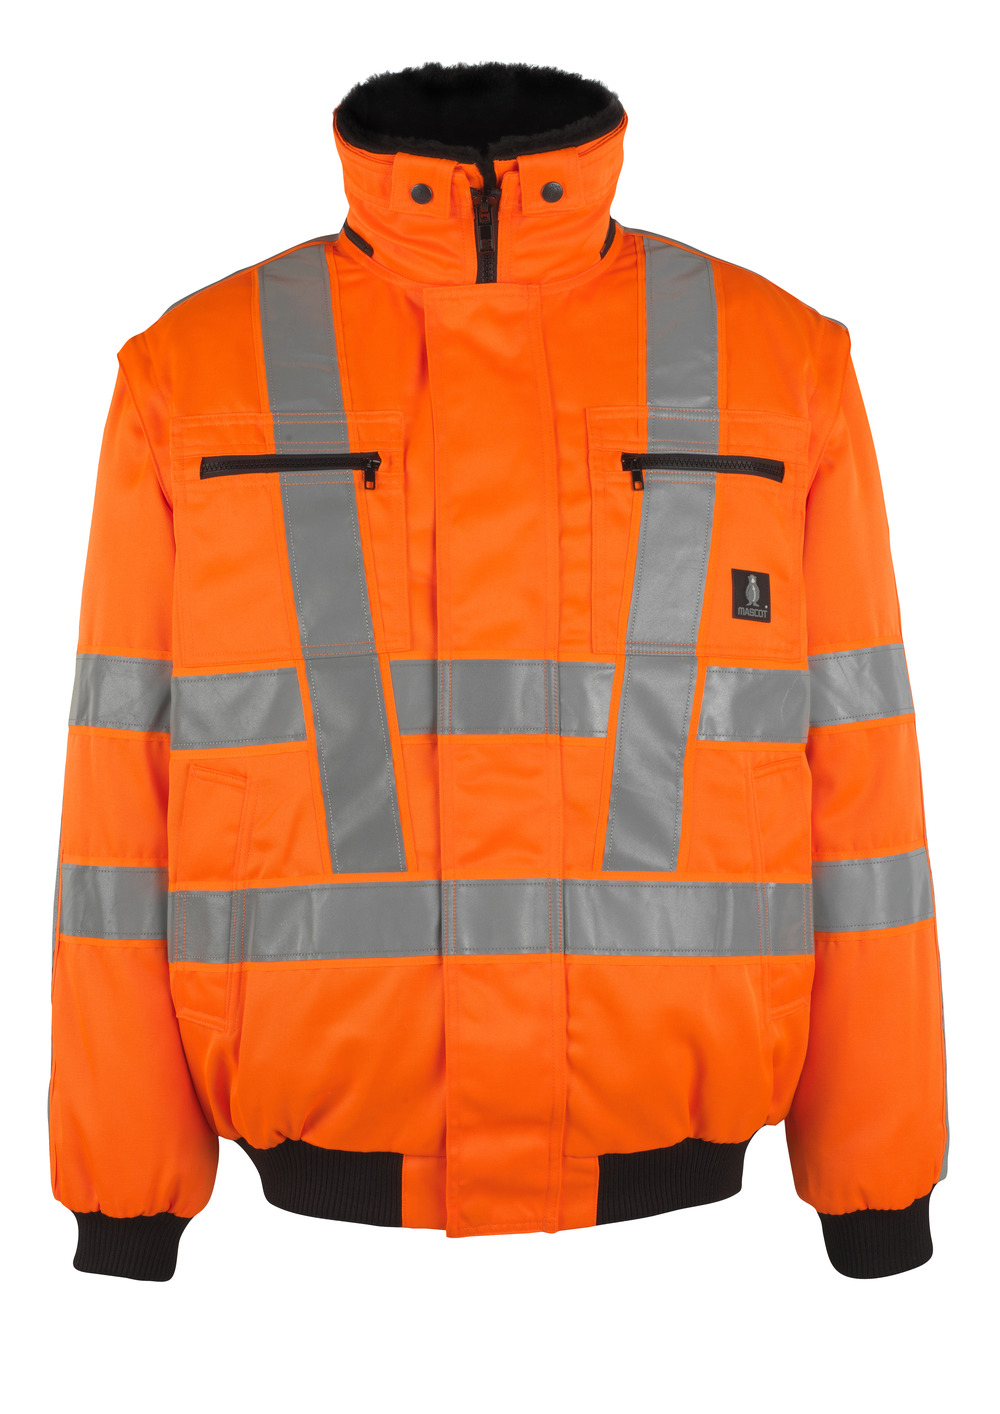 05020-660-14 Pilotjakke - hi-vis orange